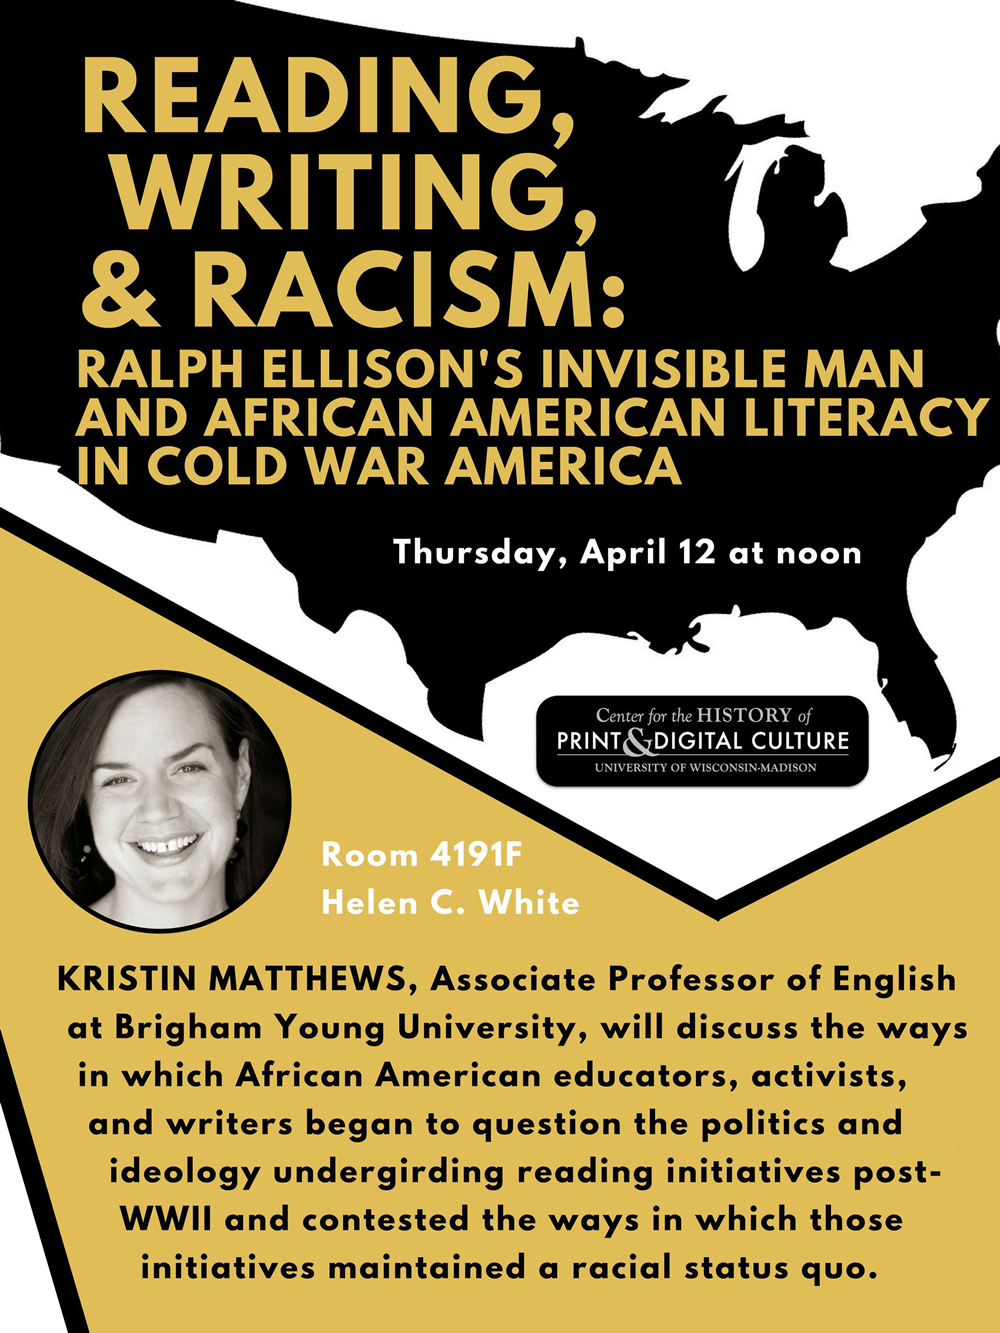 Event Poster: Kristin Matthews